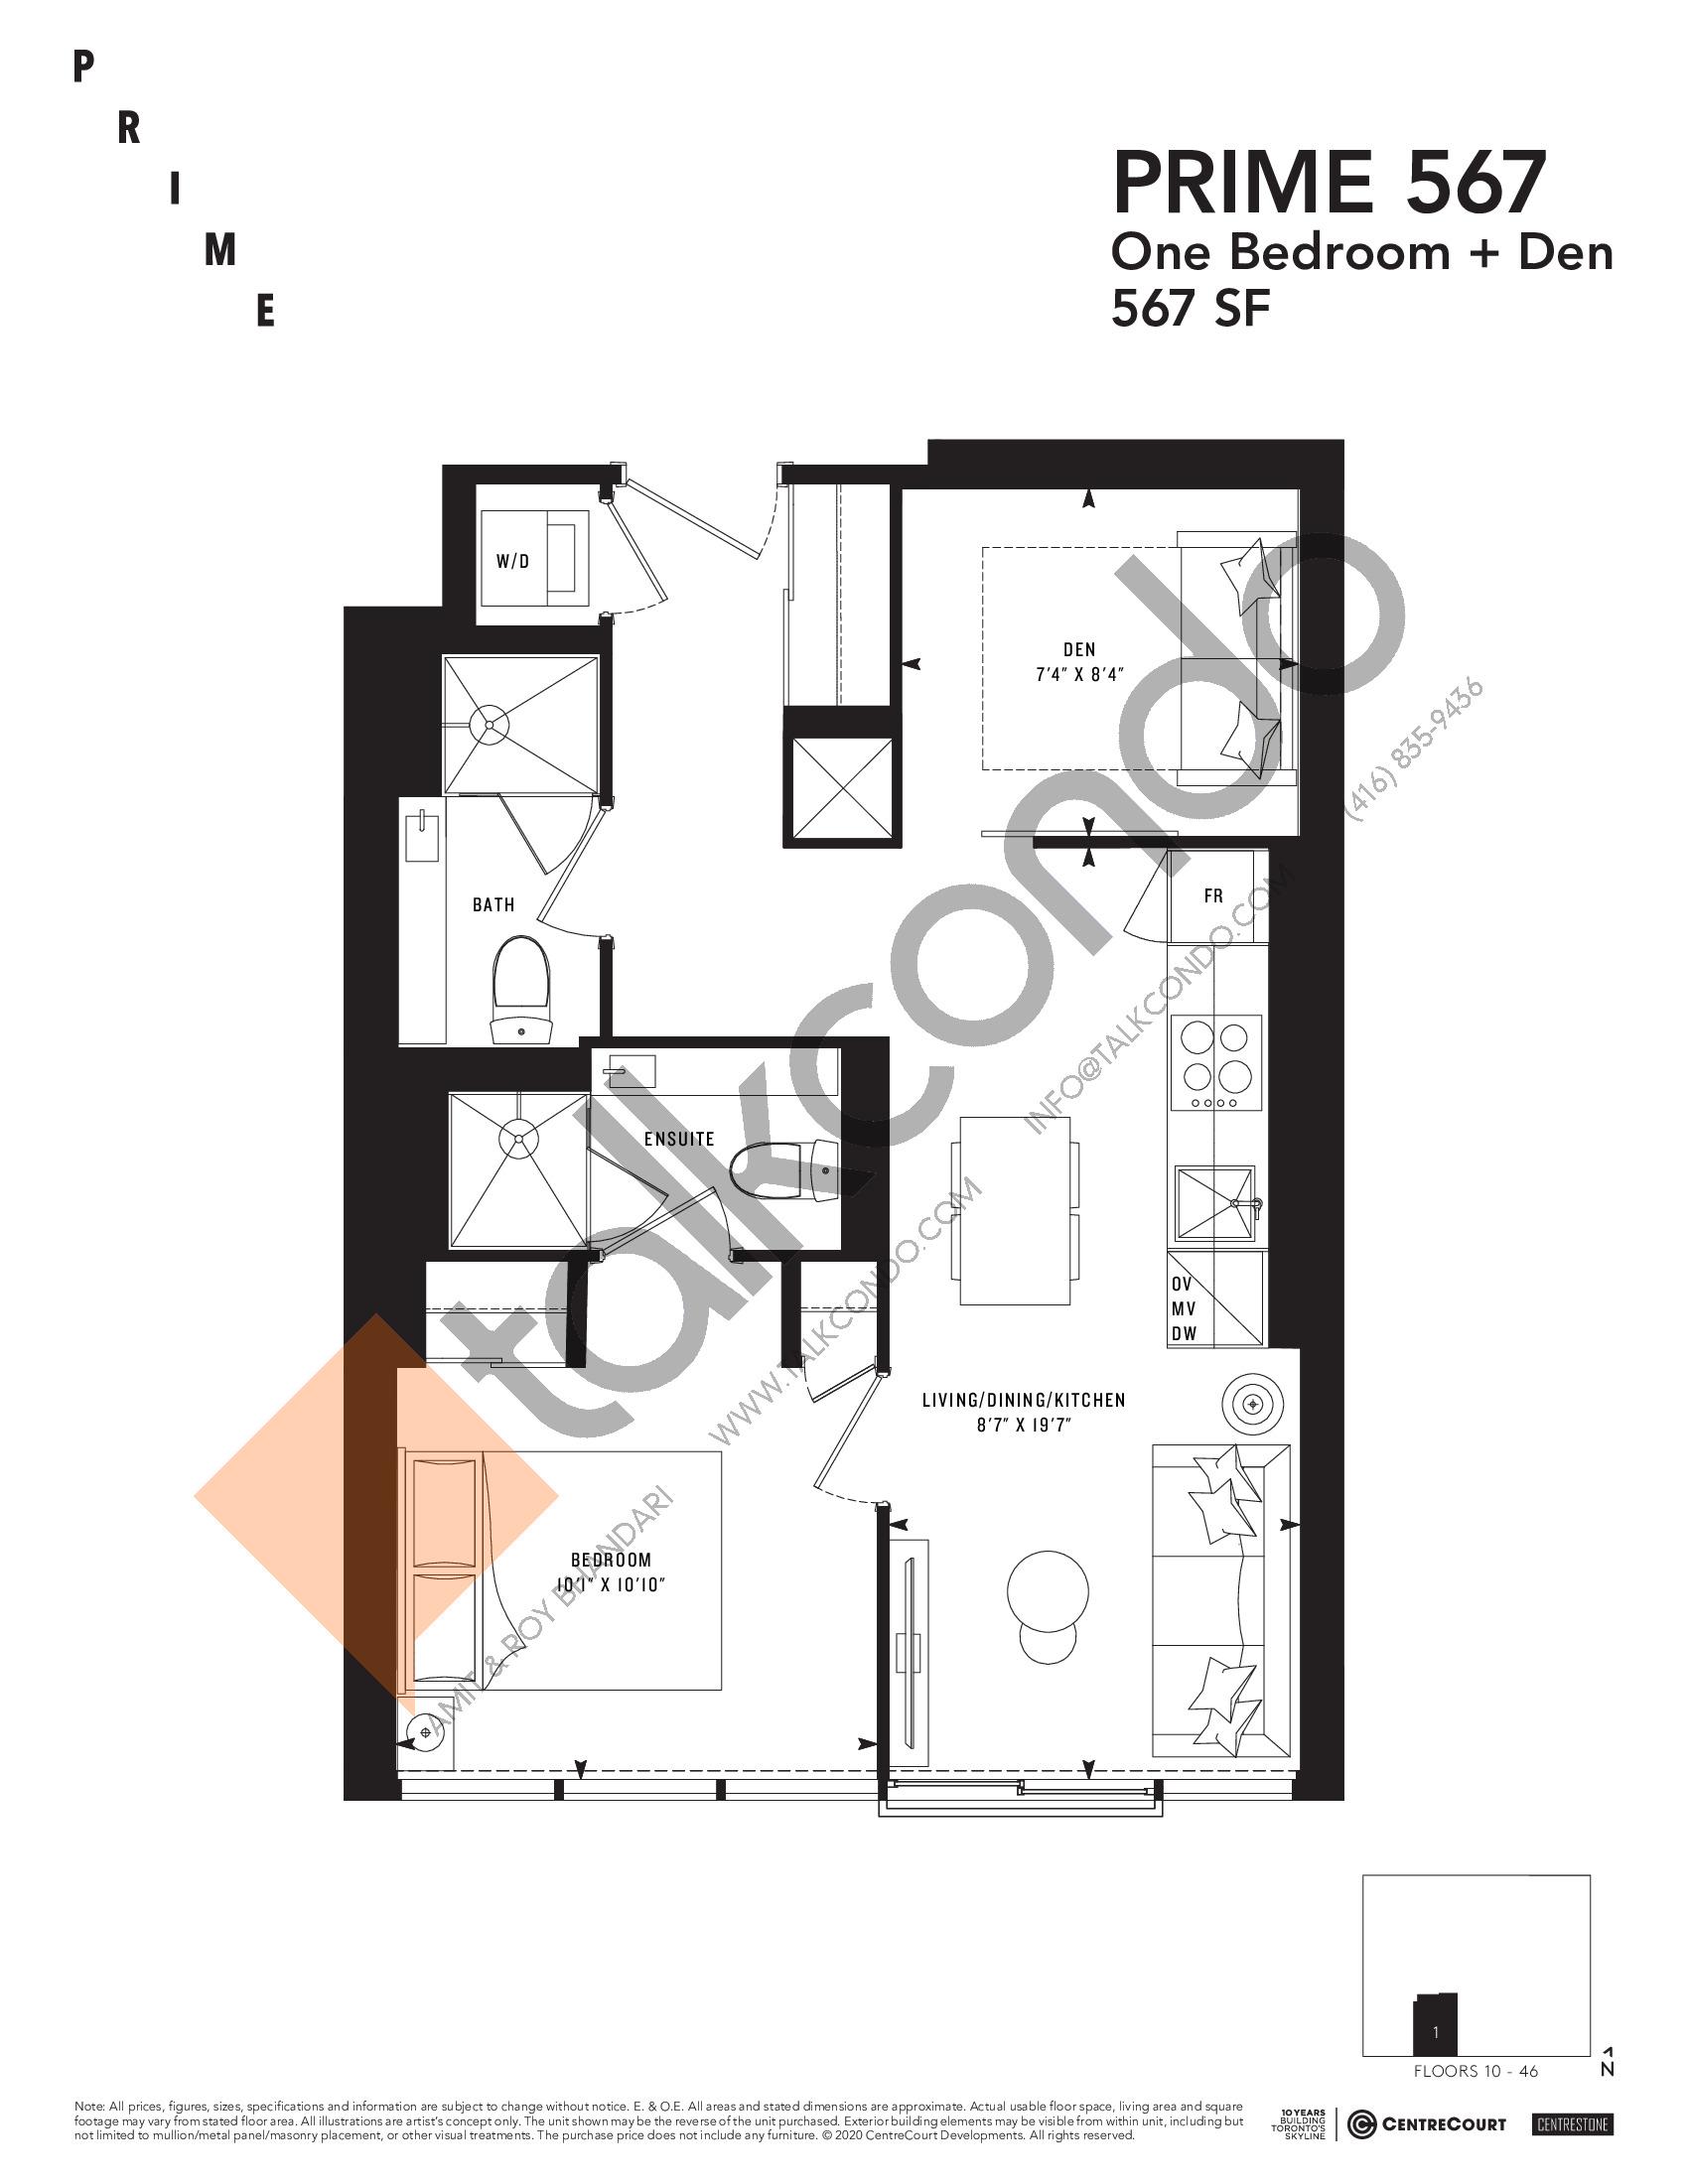 PRIME 567 Floor Plan at Prime Condos - 567 sq.ft